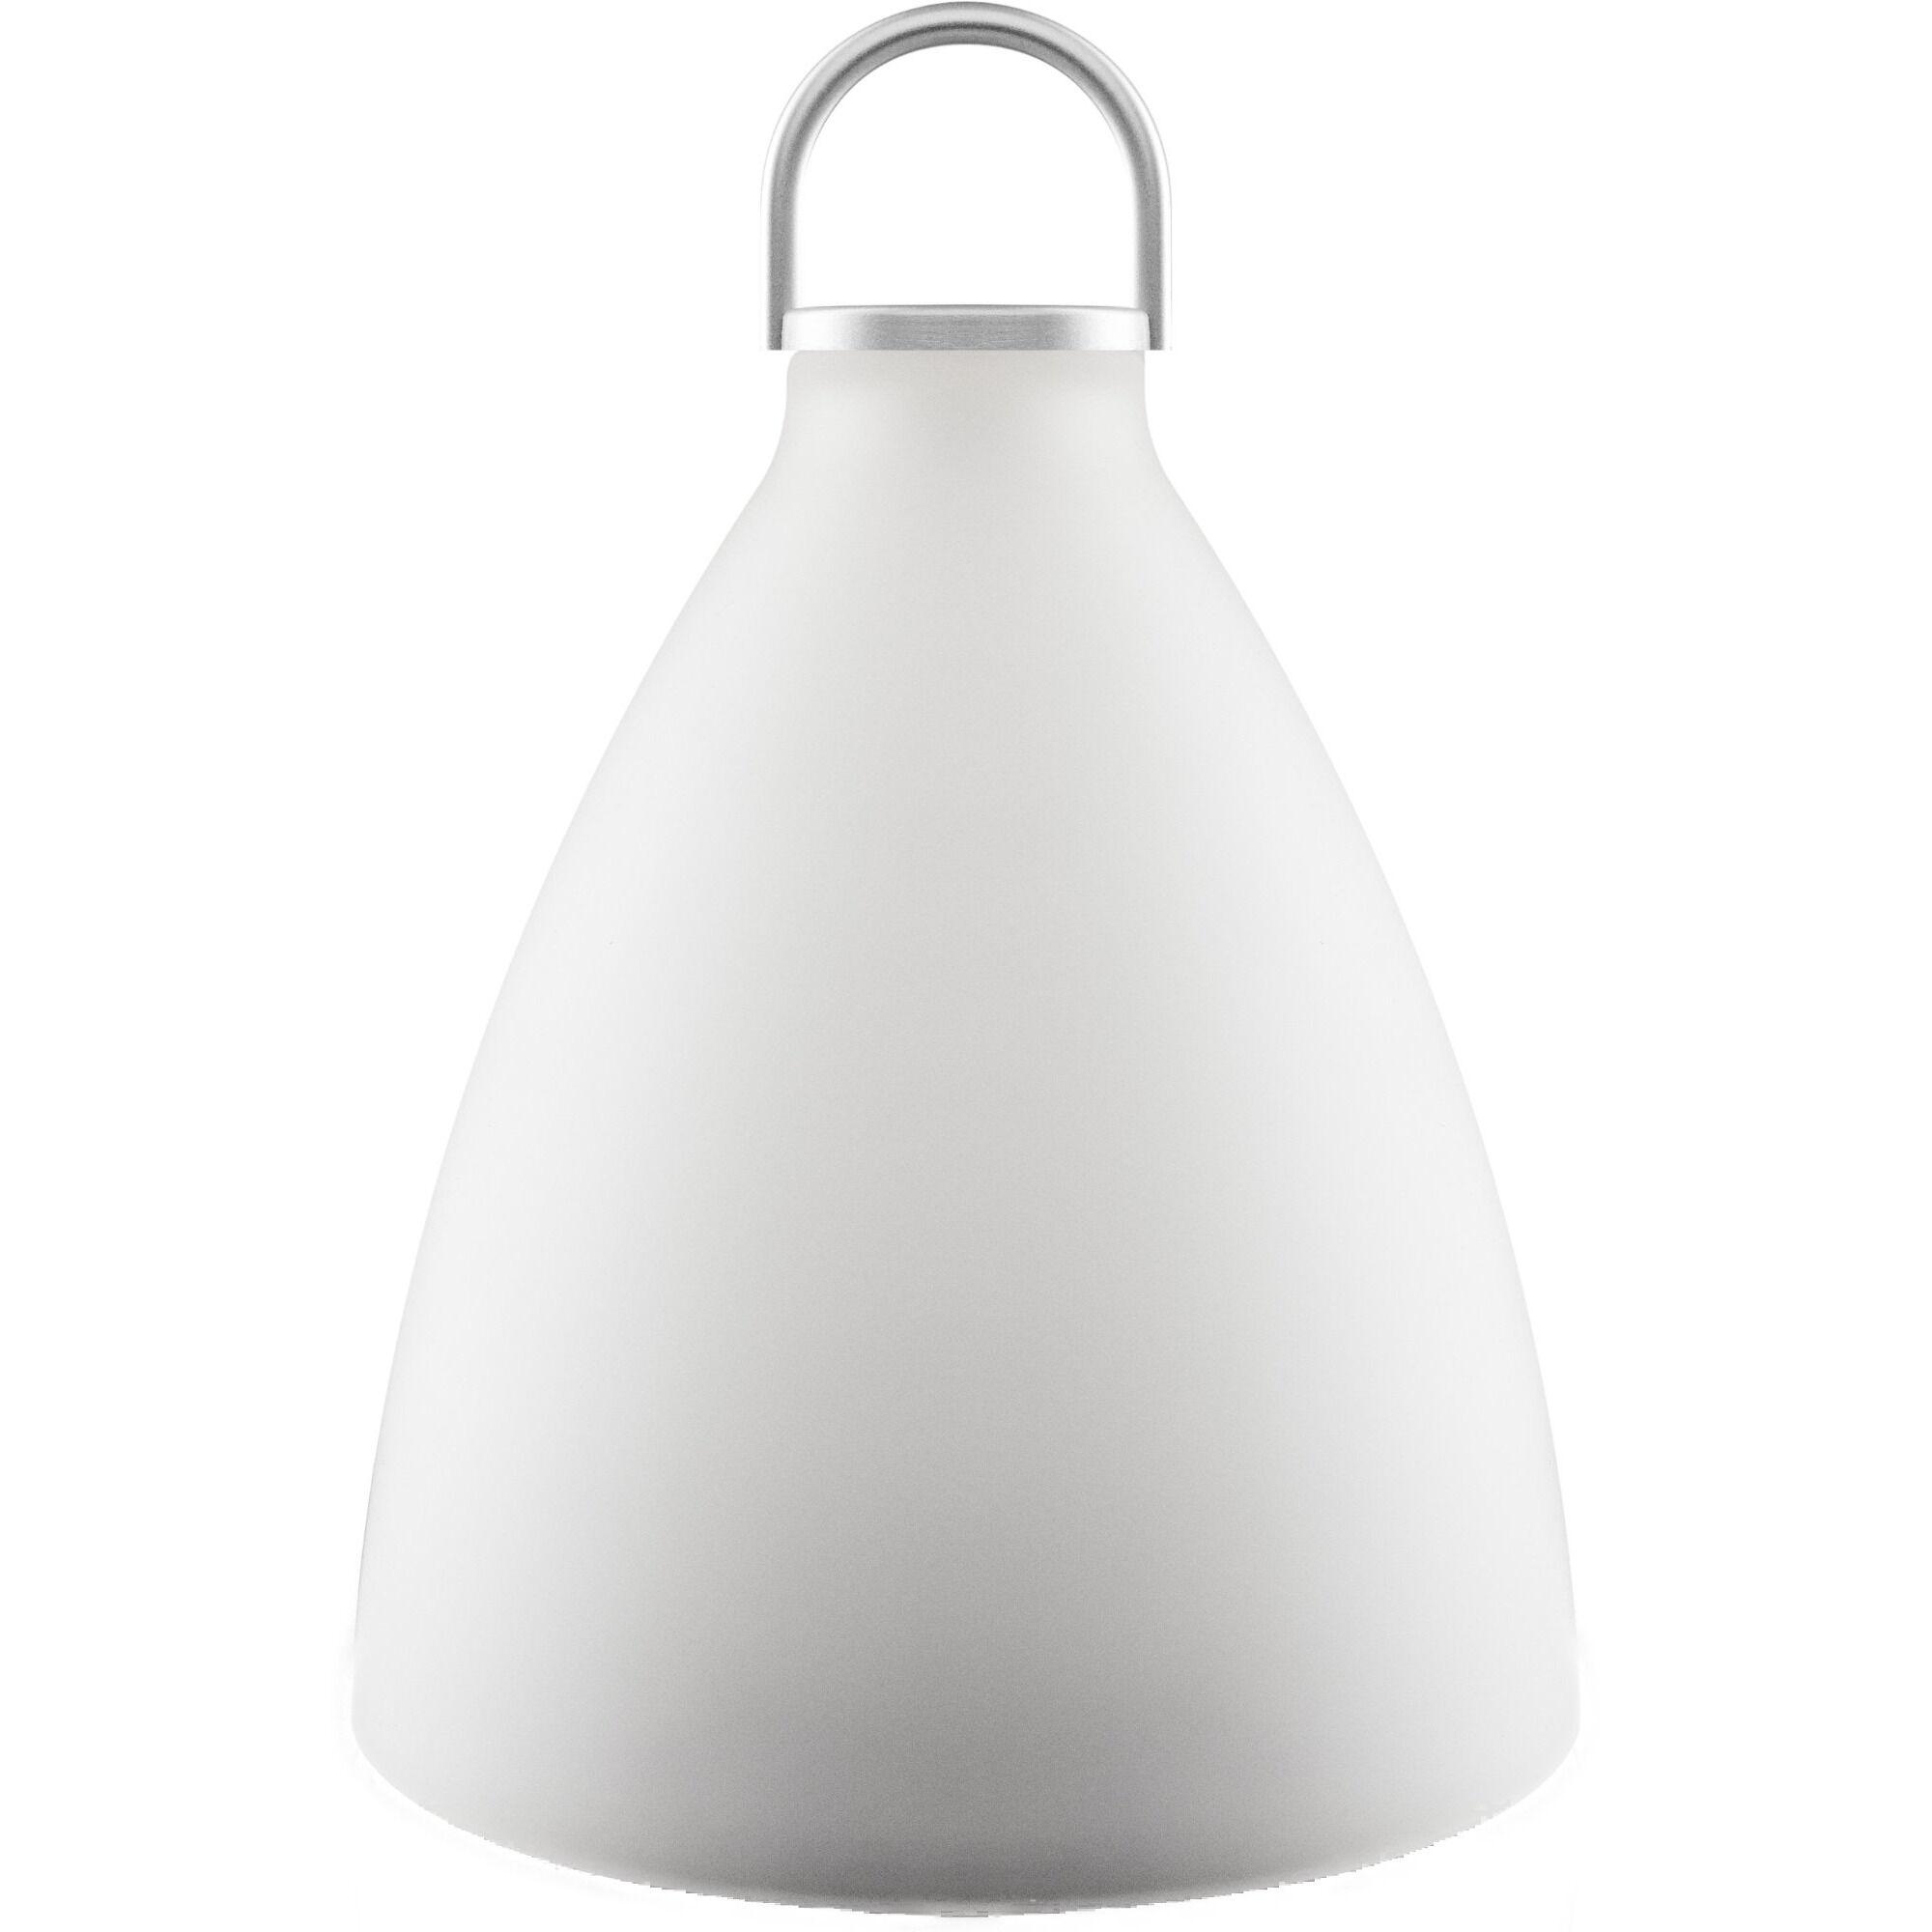 Eva Solo SunLight Lampe 20 cm